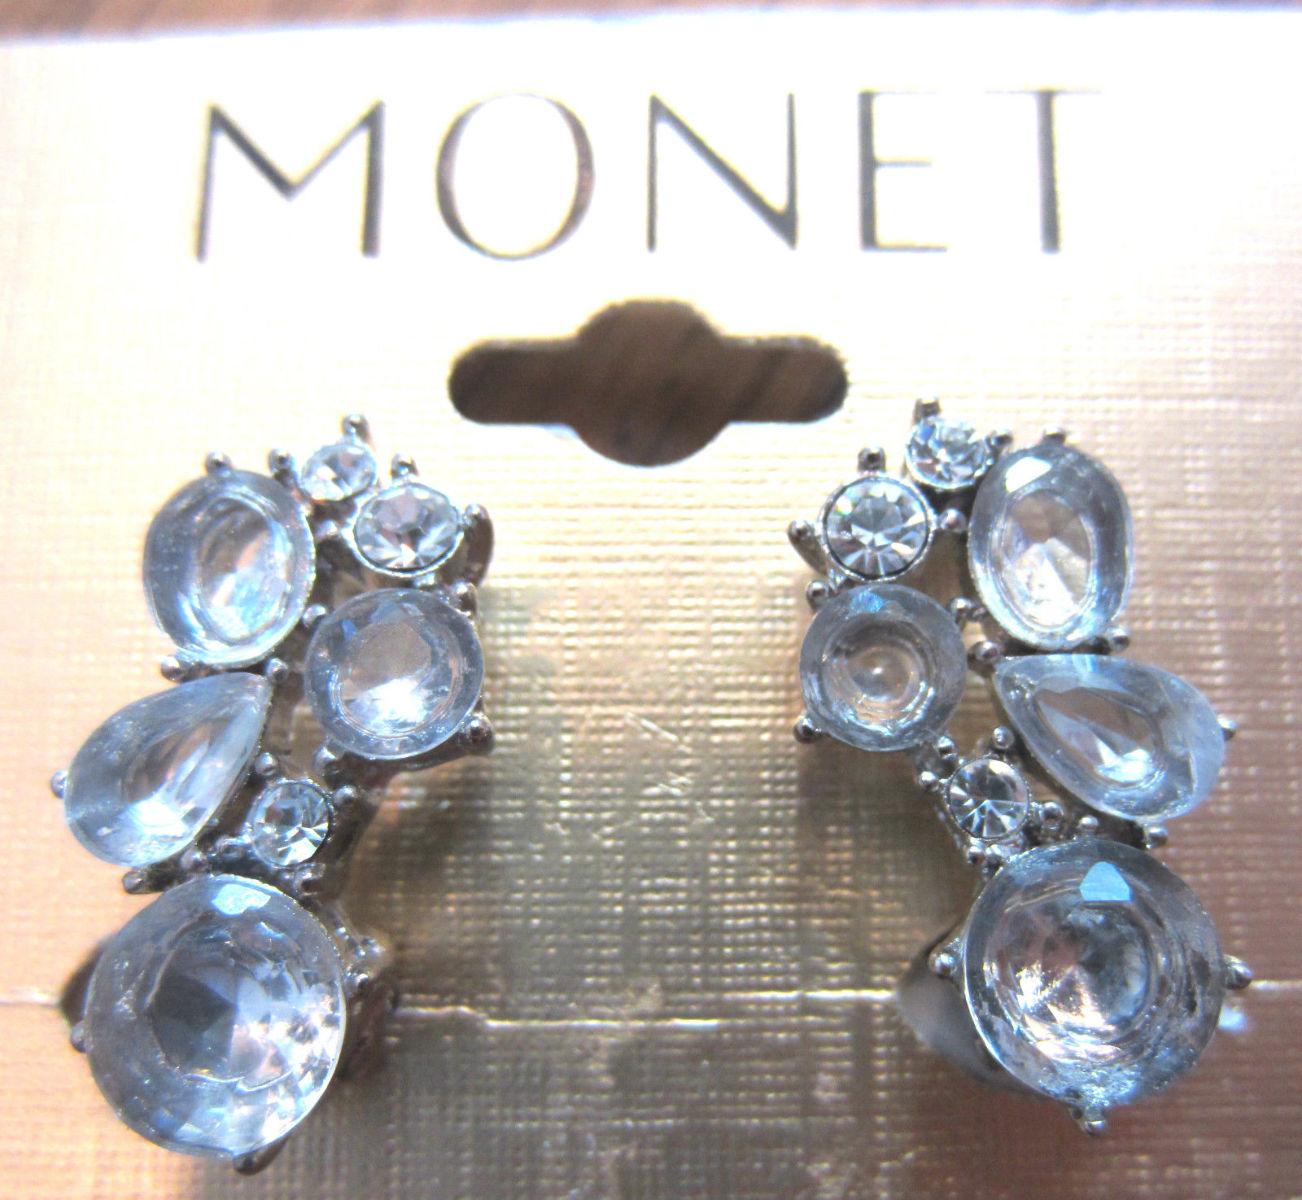 Monet Signed Rhinestone Bling Ice Clip Earrings Vintage ...